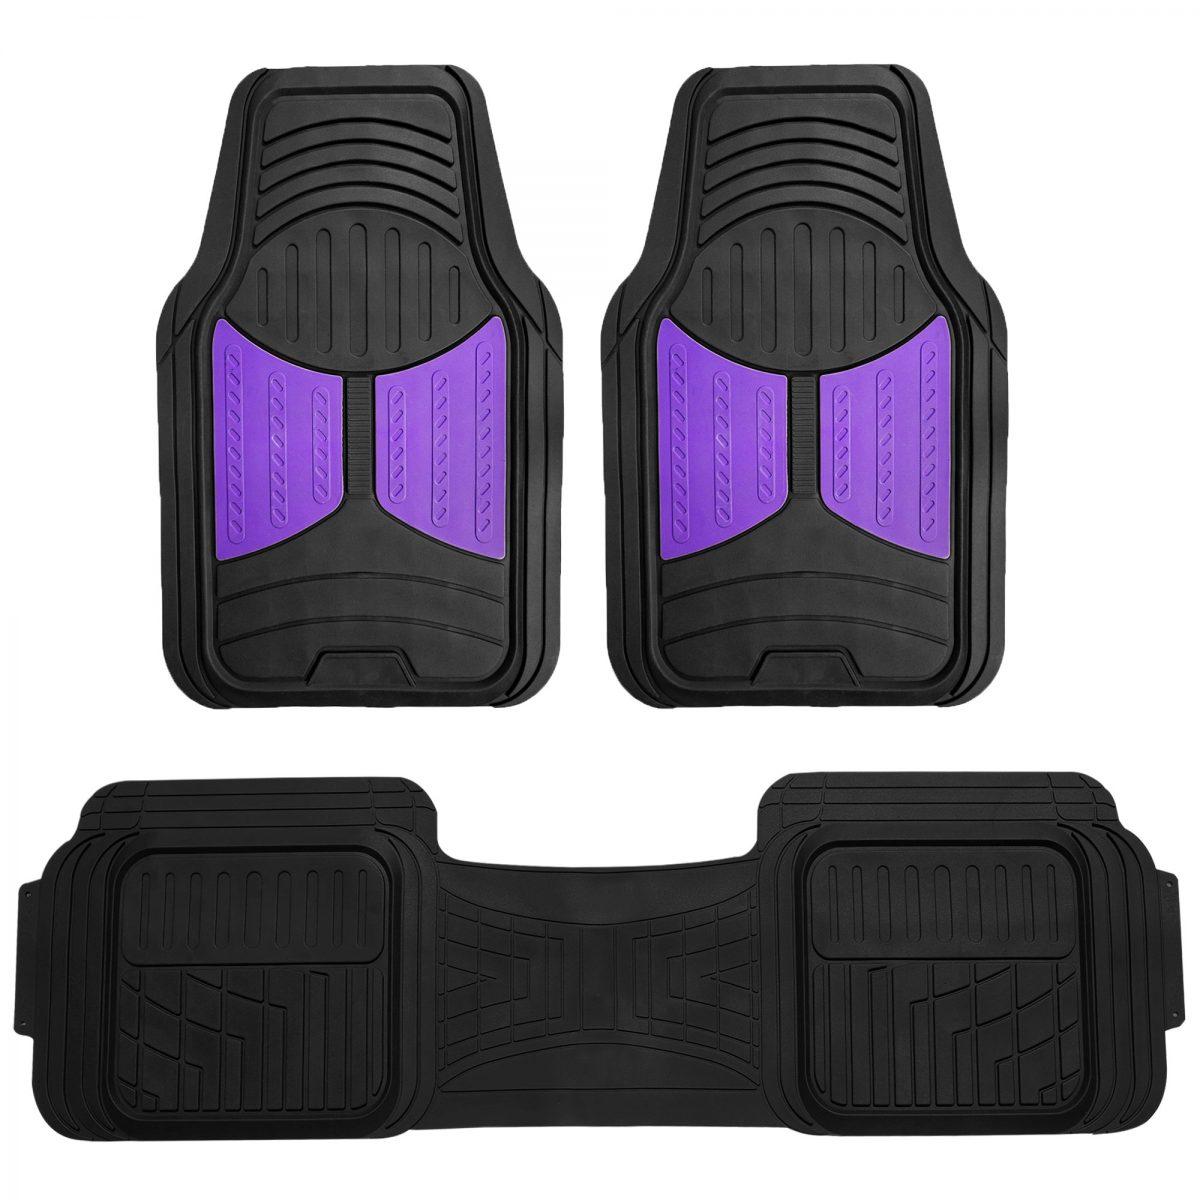 f11513_purple_FULLSET floor mats